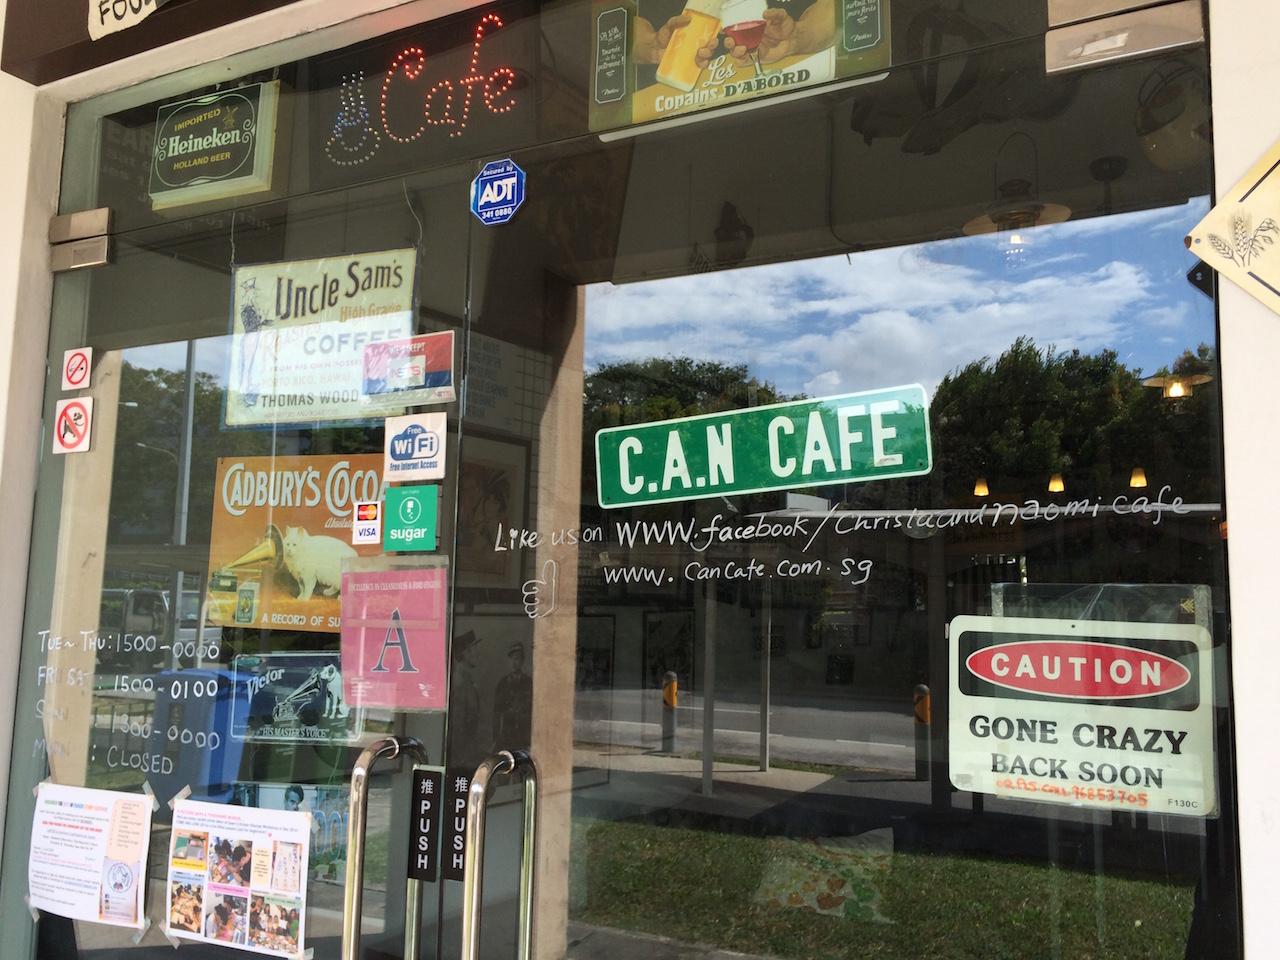 C.A.N Cafe at 730 Upper Serangoon Road